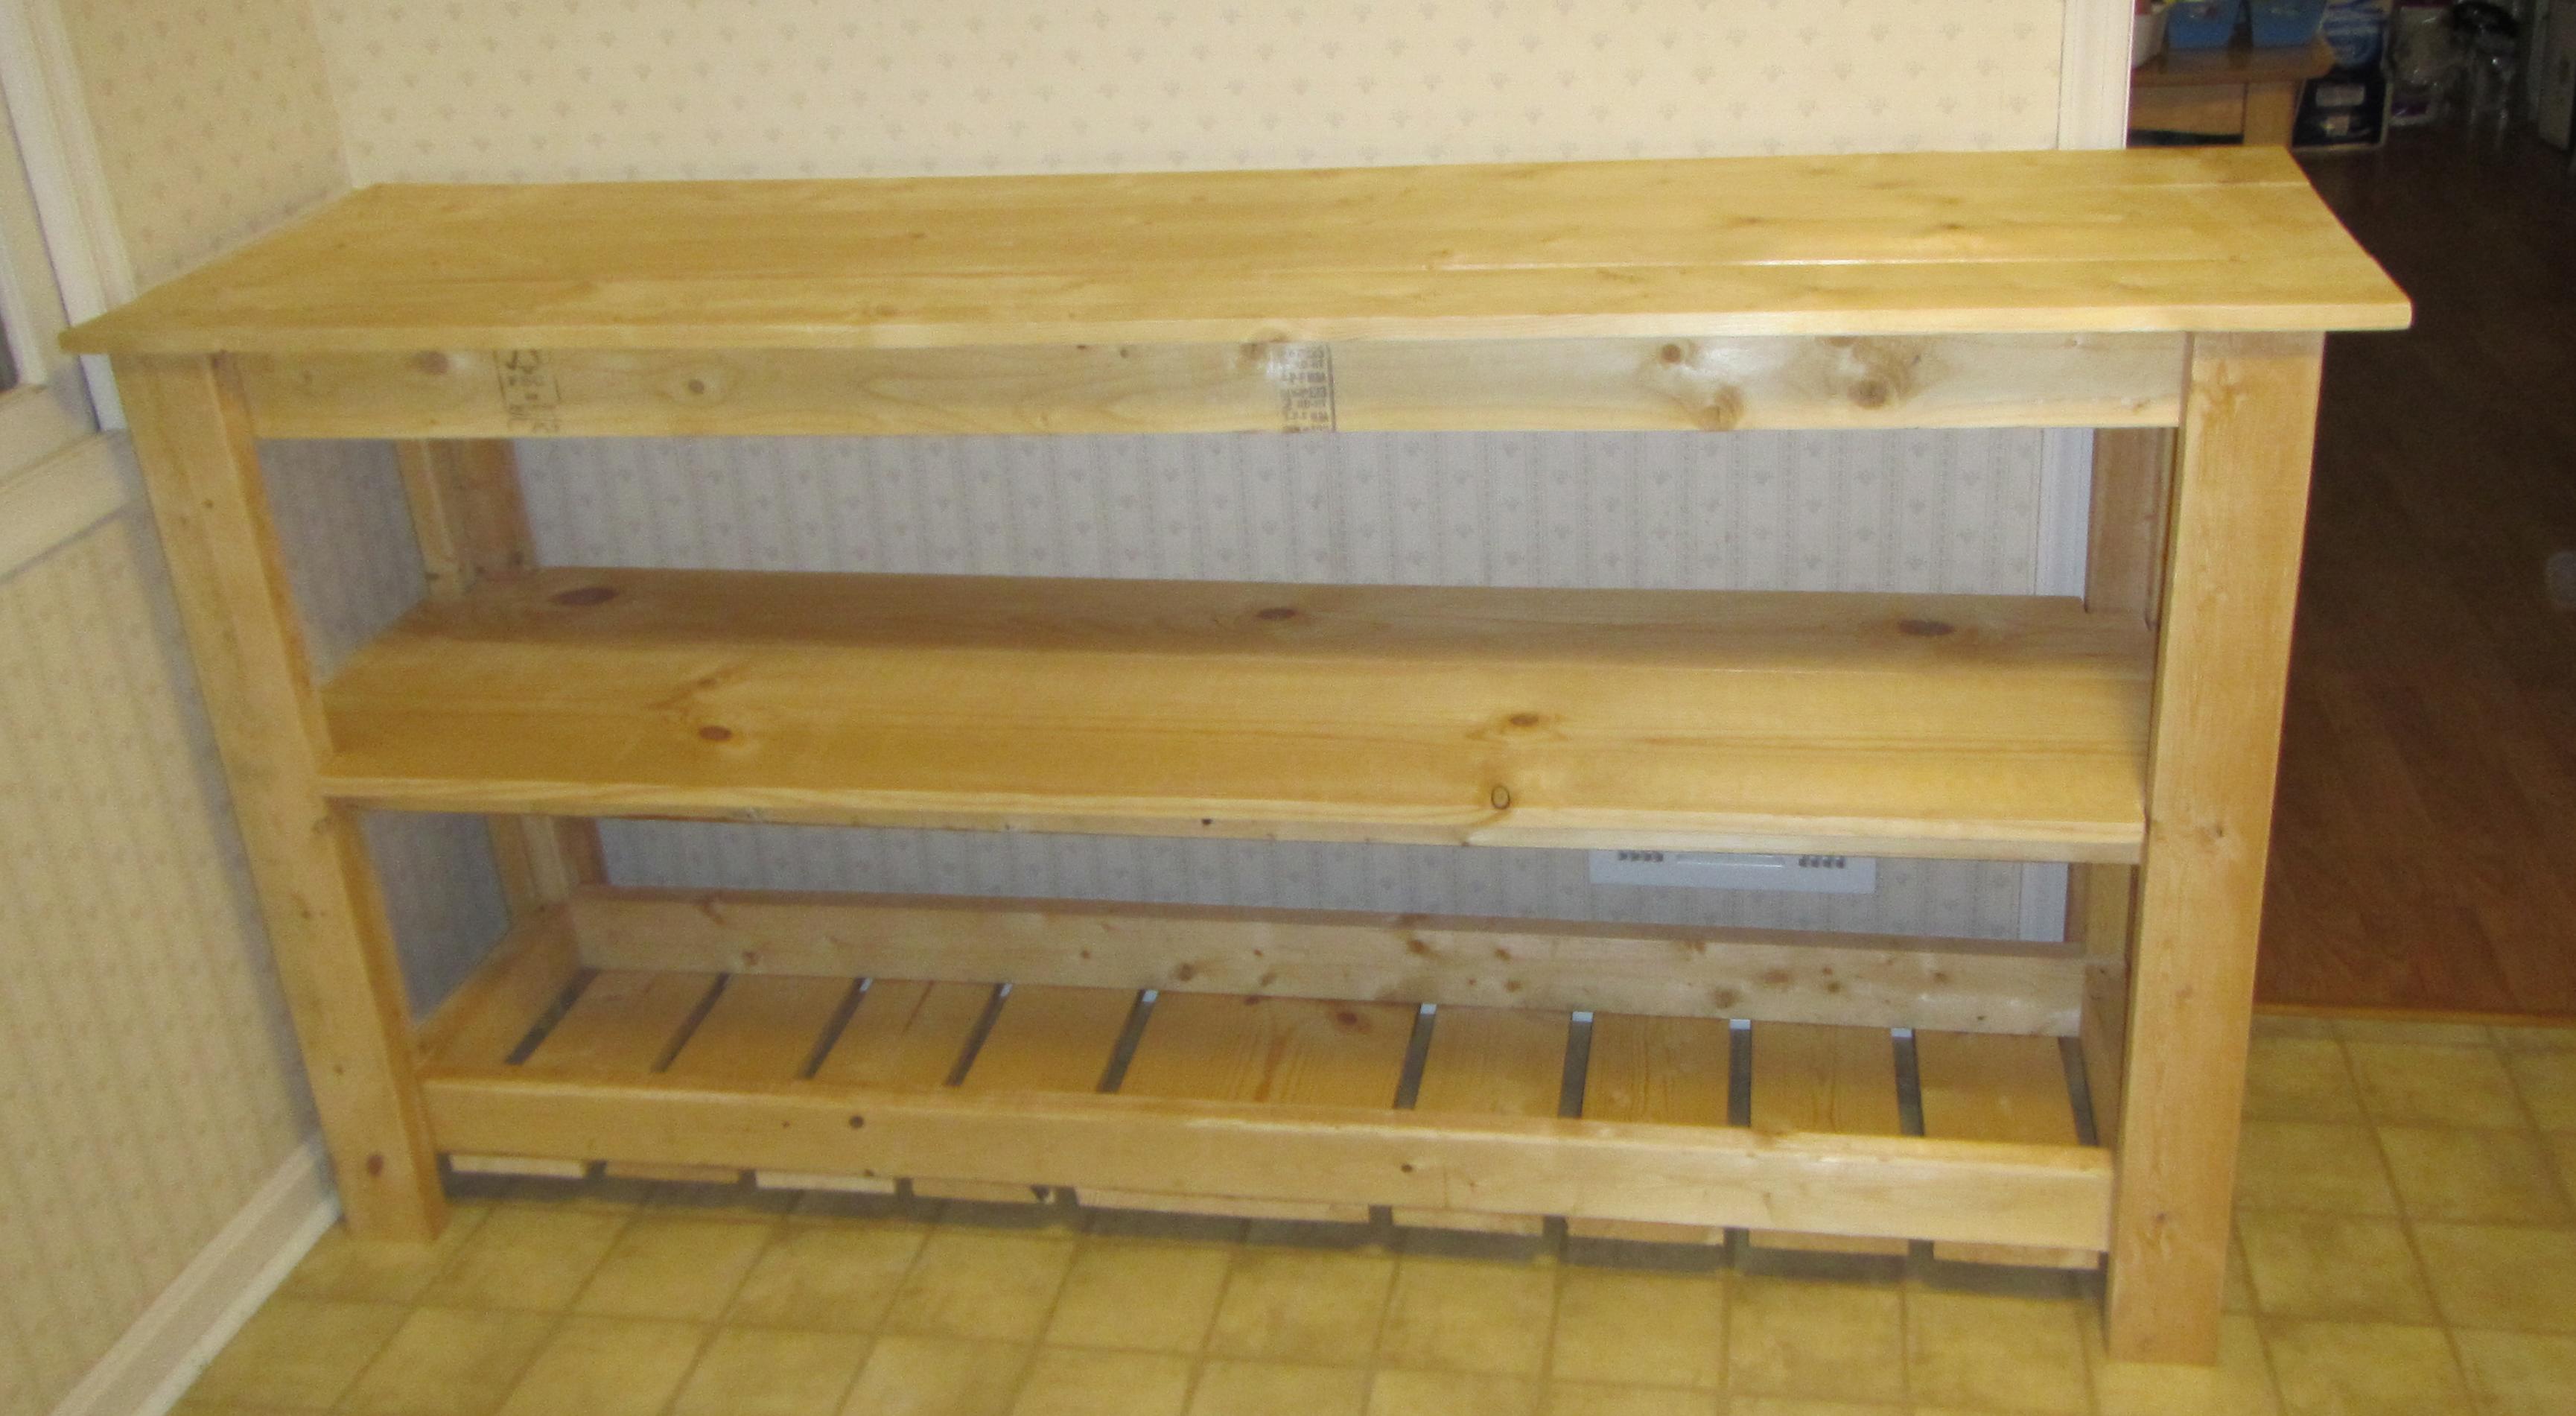 Picture of DIY Kitchen Shelving Unit Under $150